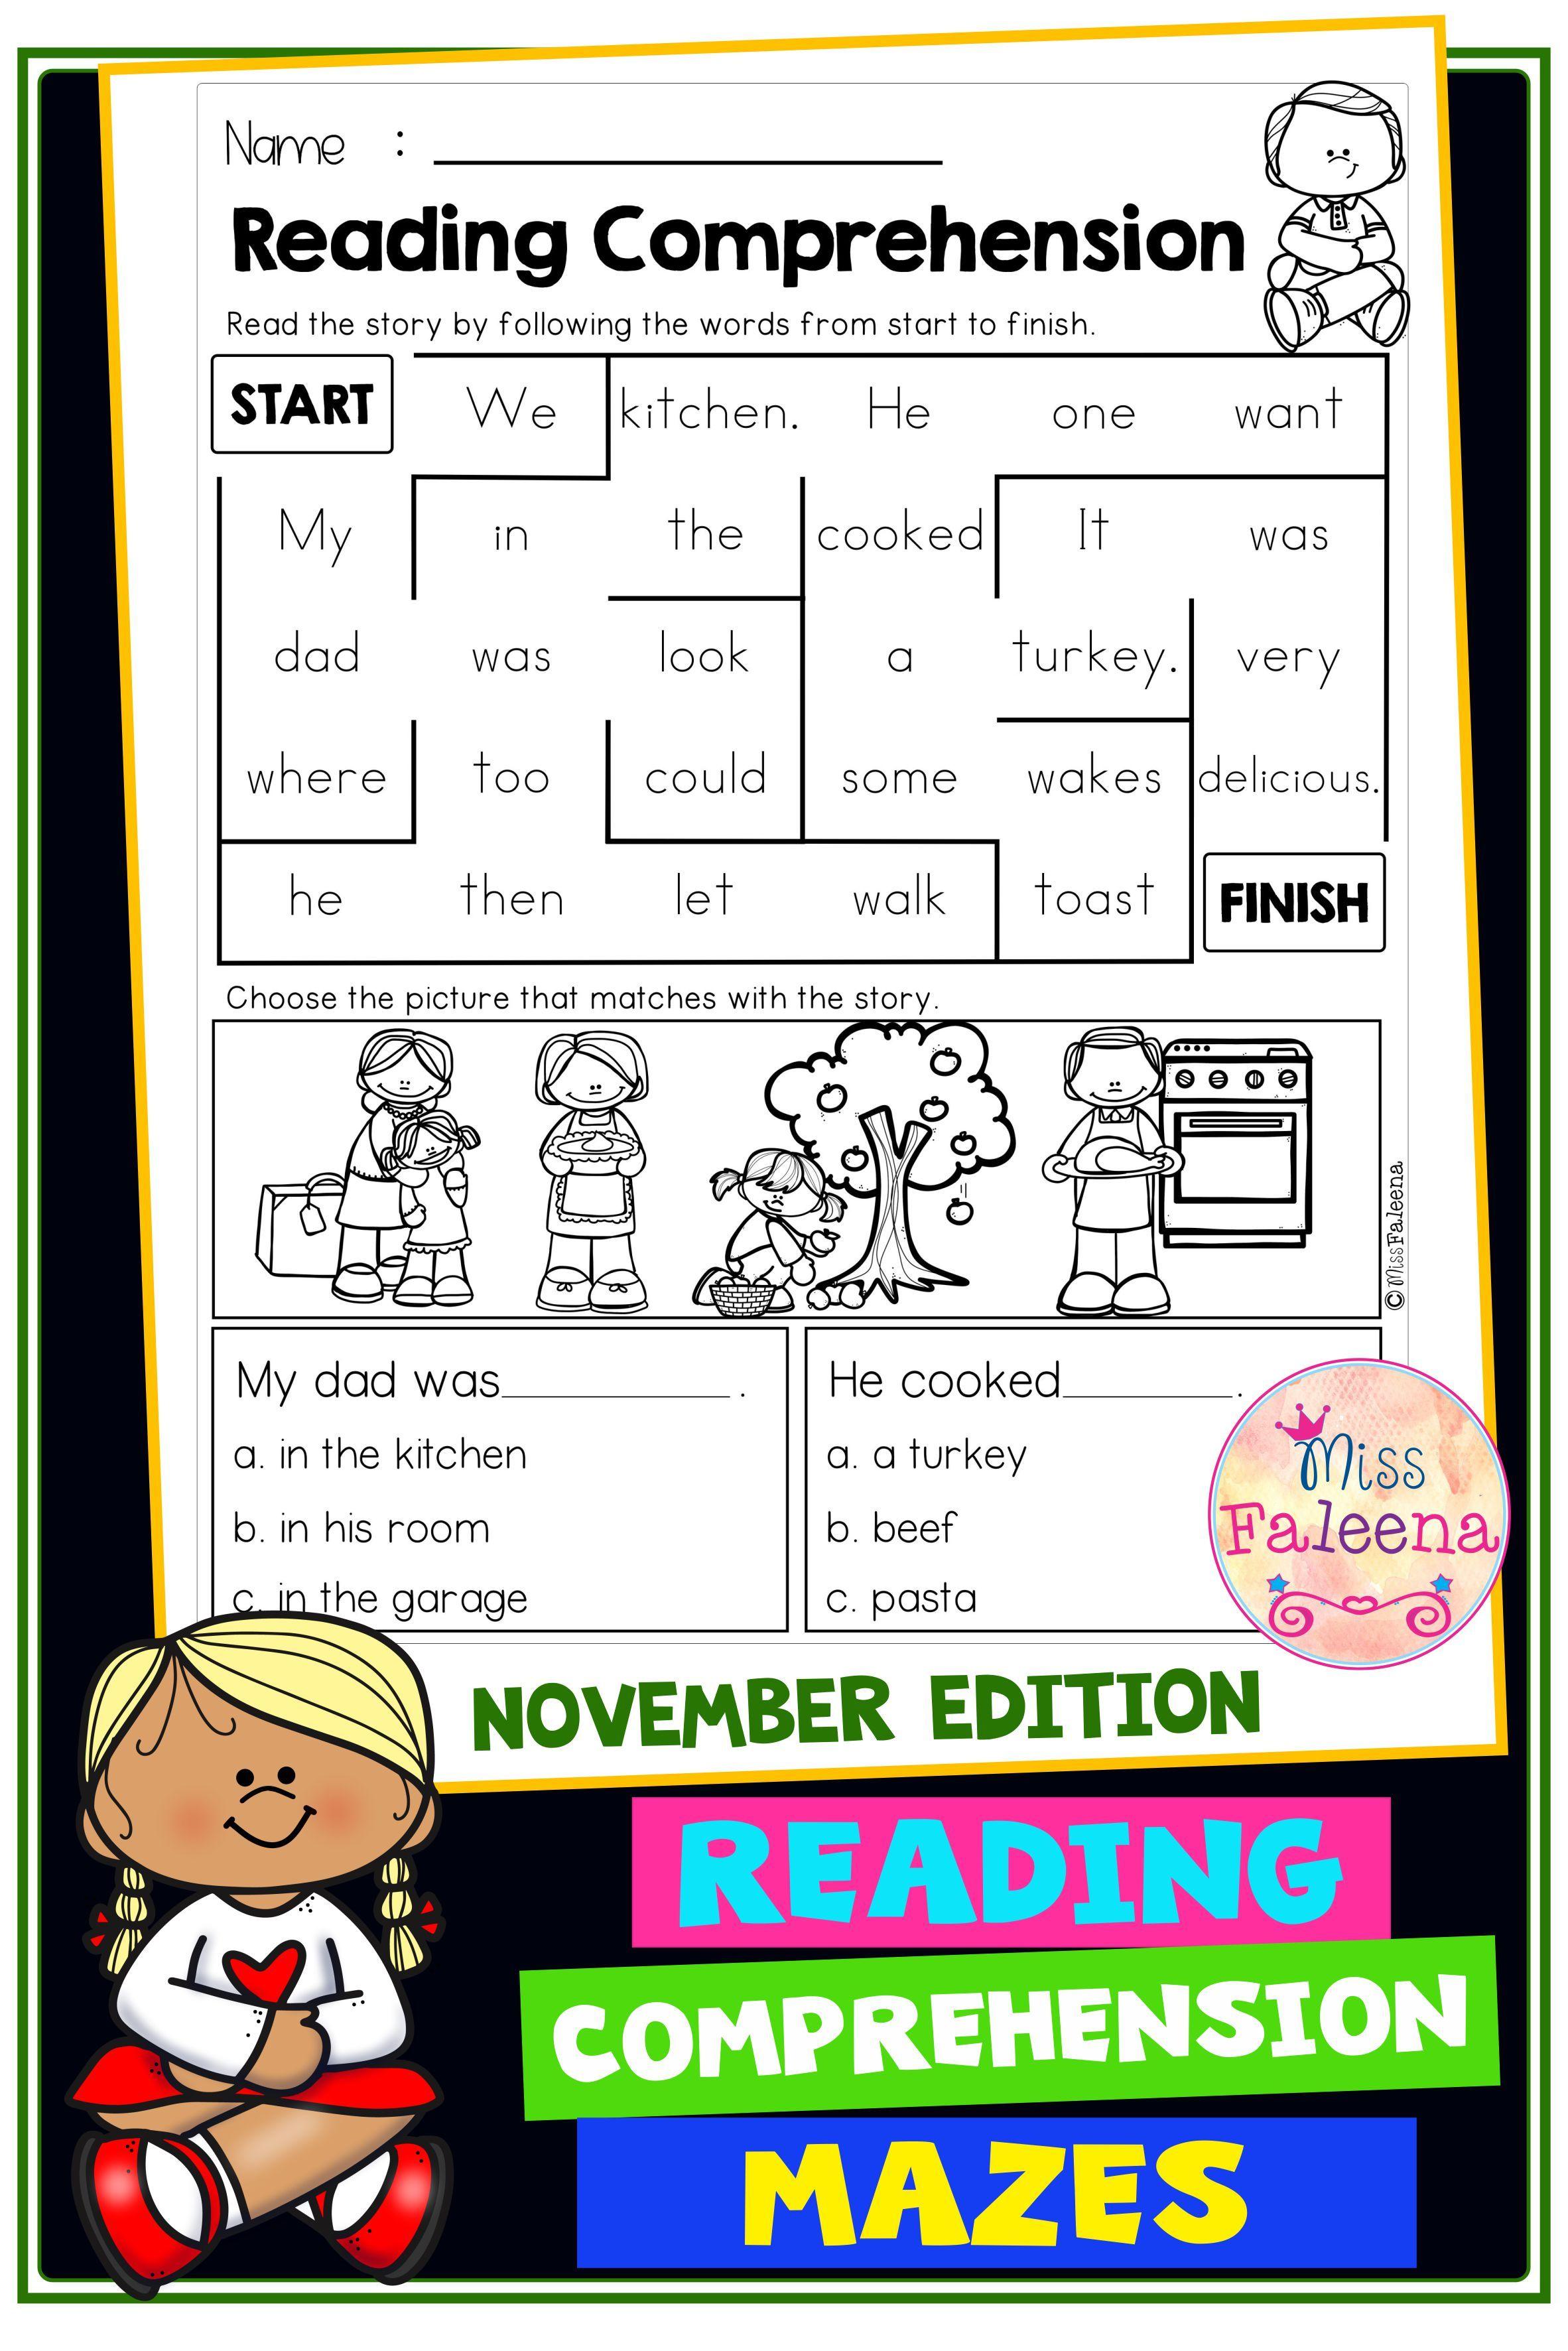 November Reading Comprehension Mazes Reading Comprehension Common Core Kindergarten Reading First Grade Reading Comprehension First grade reading programs online